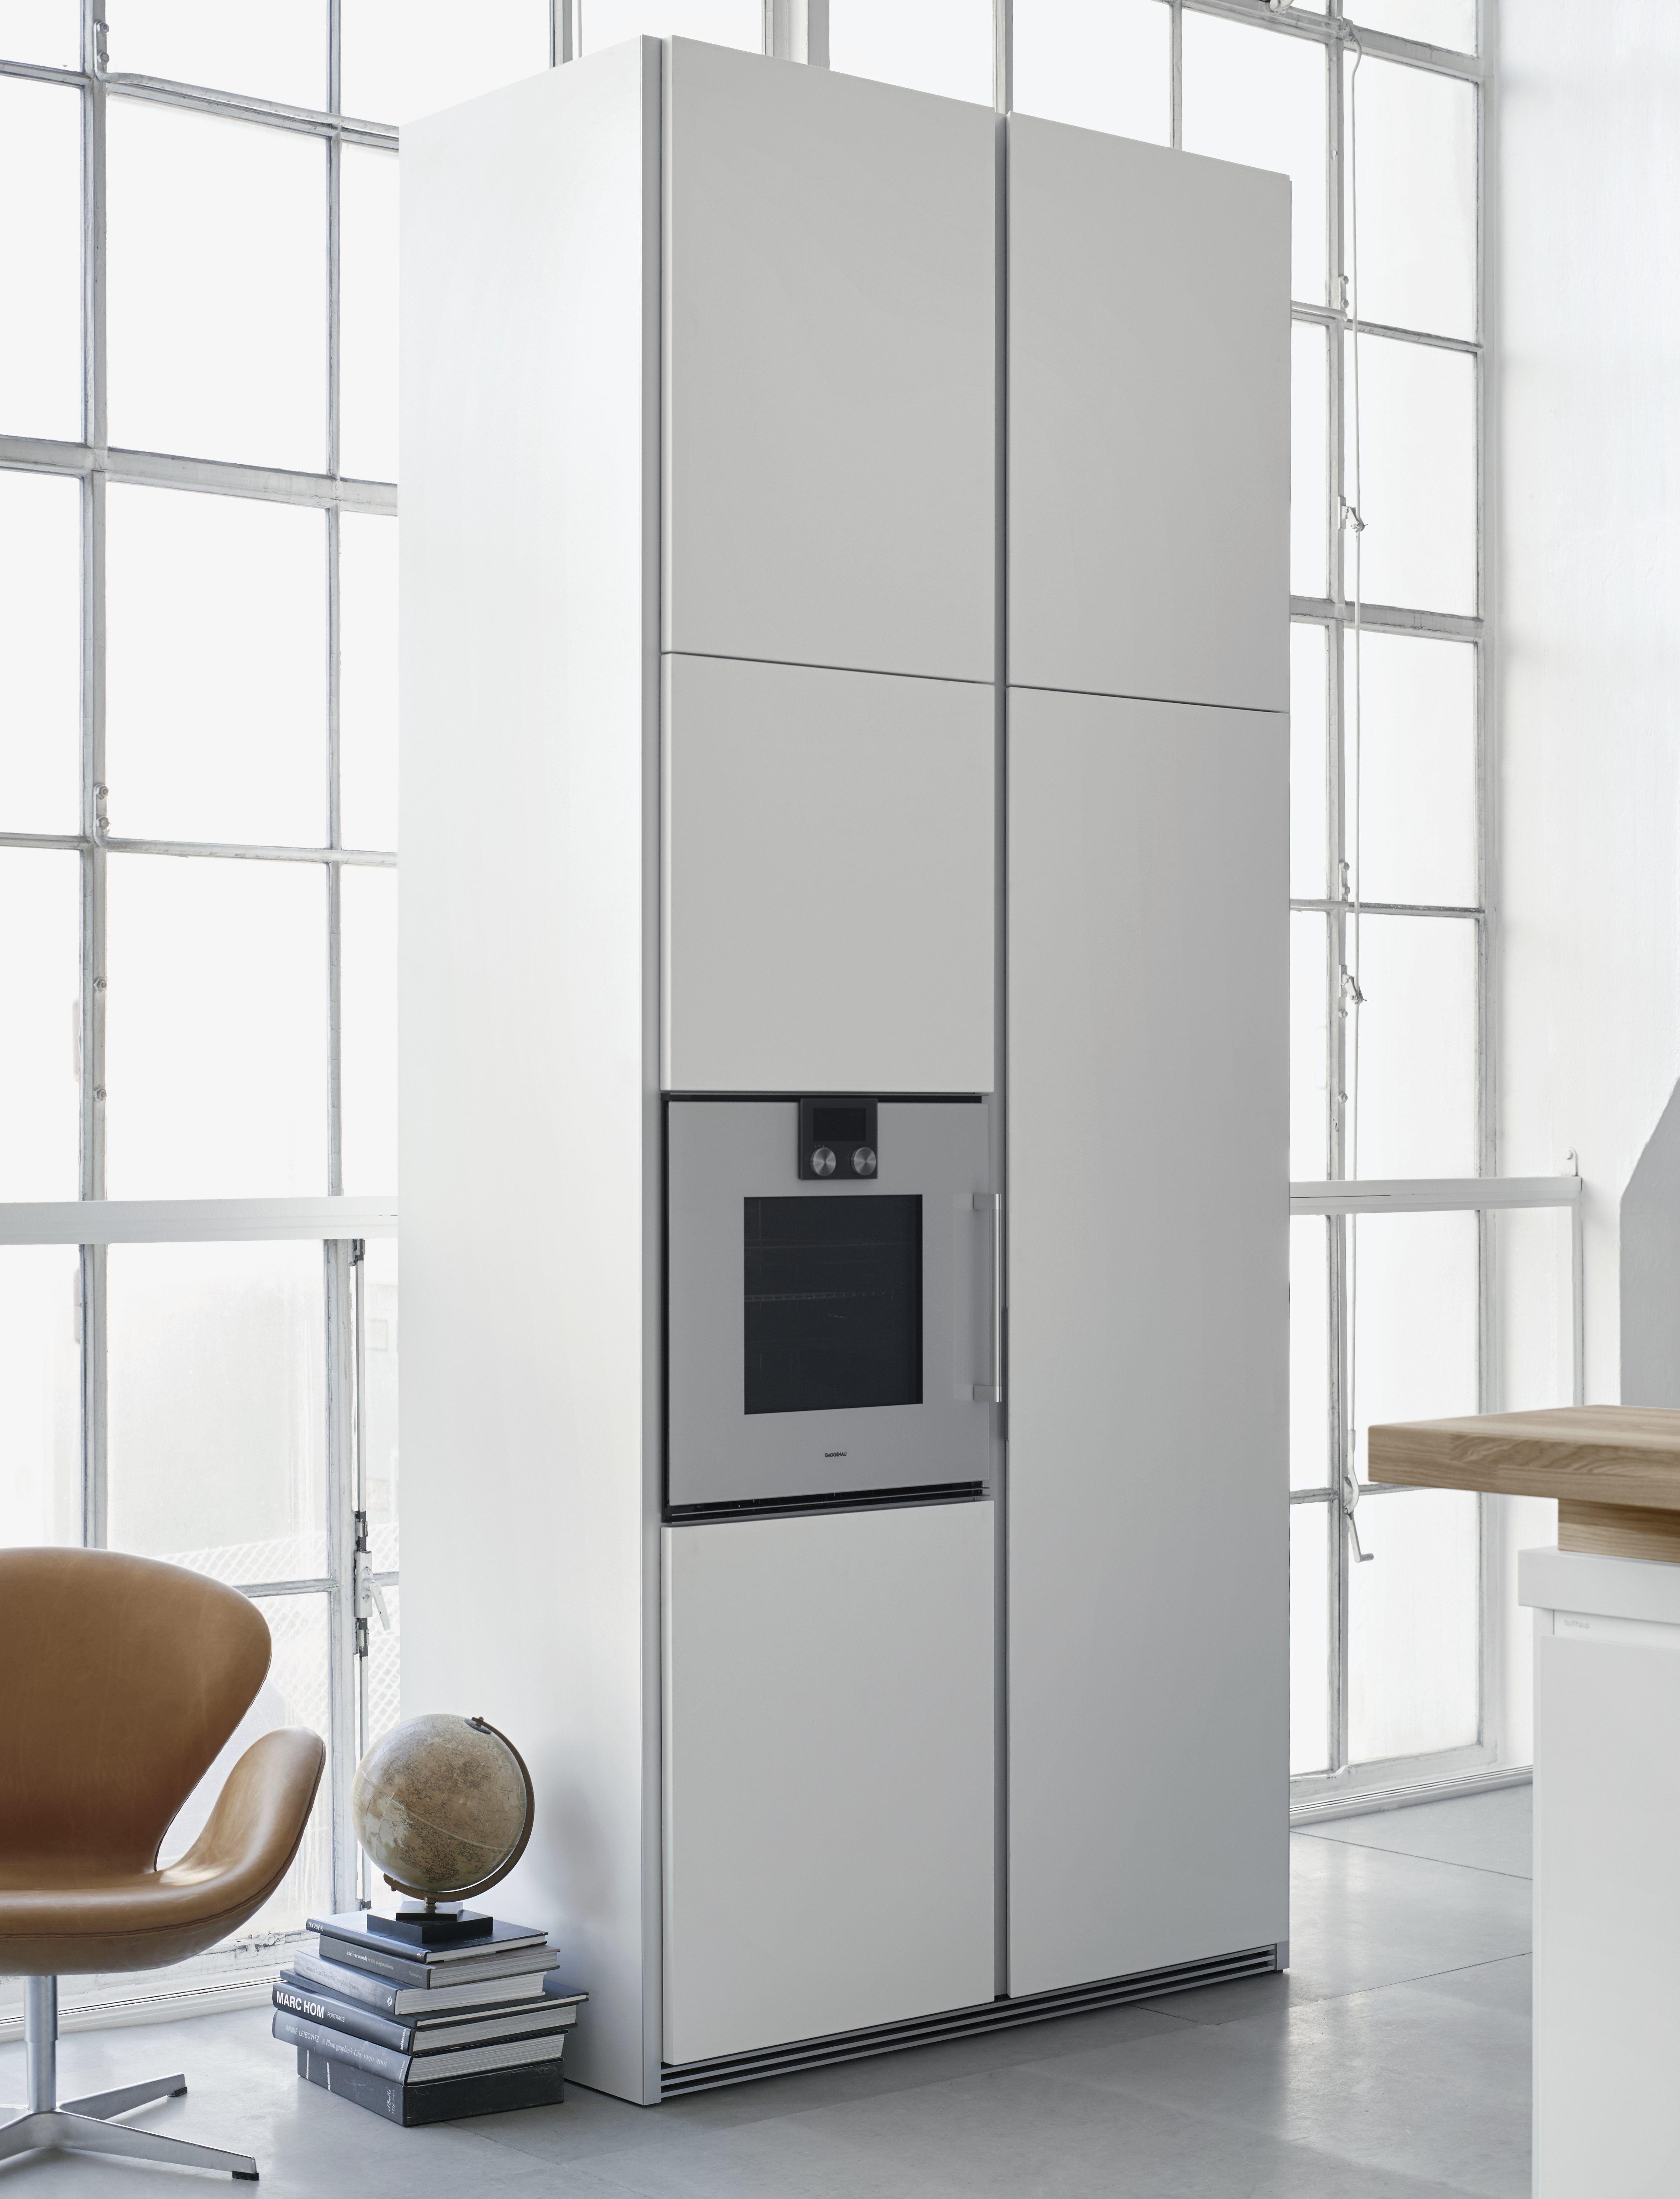 Bulthaup B1 White Lacquer Tall Cabinets Gaggenau Oven Kitchen